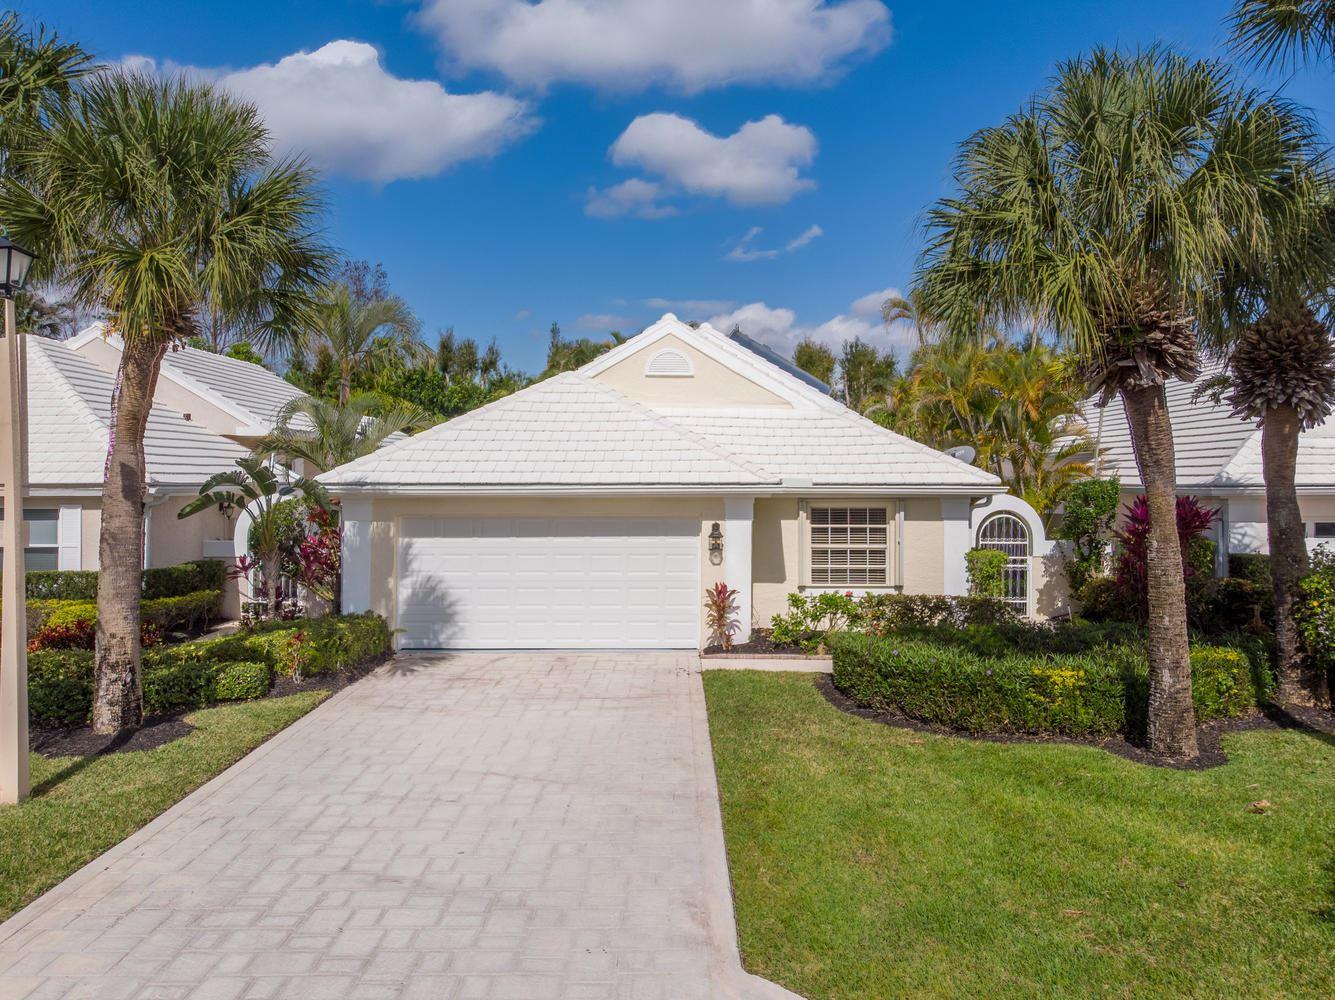 9293 Heathridge Drive, West Palm Beach, FL 33411 - #: RX-10600011